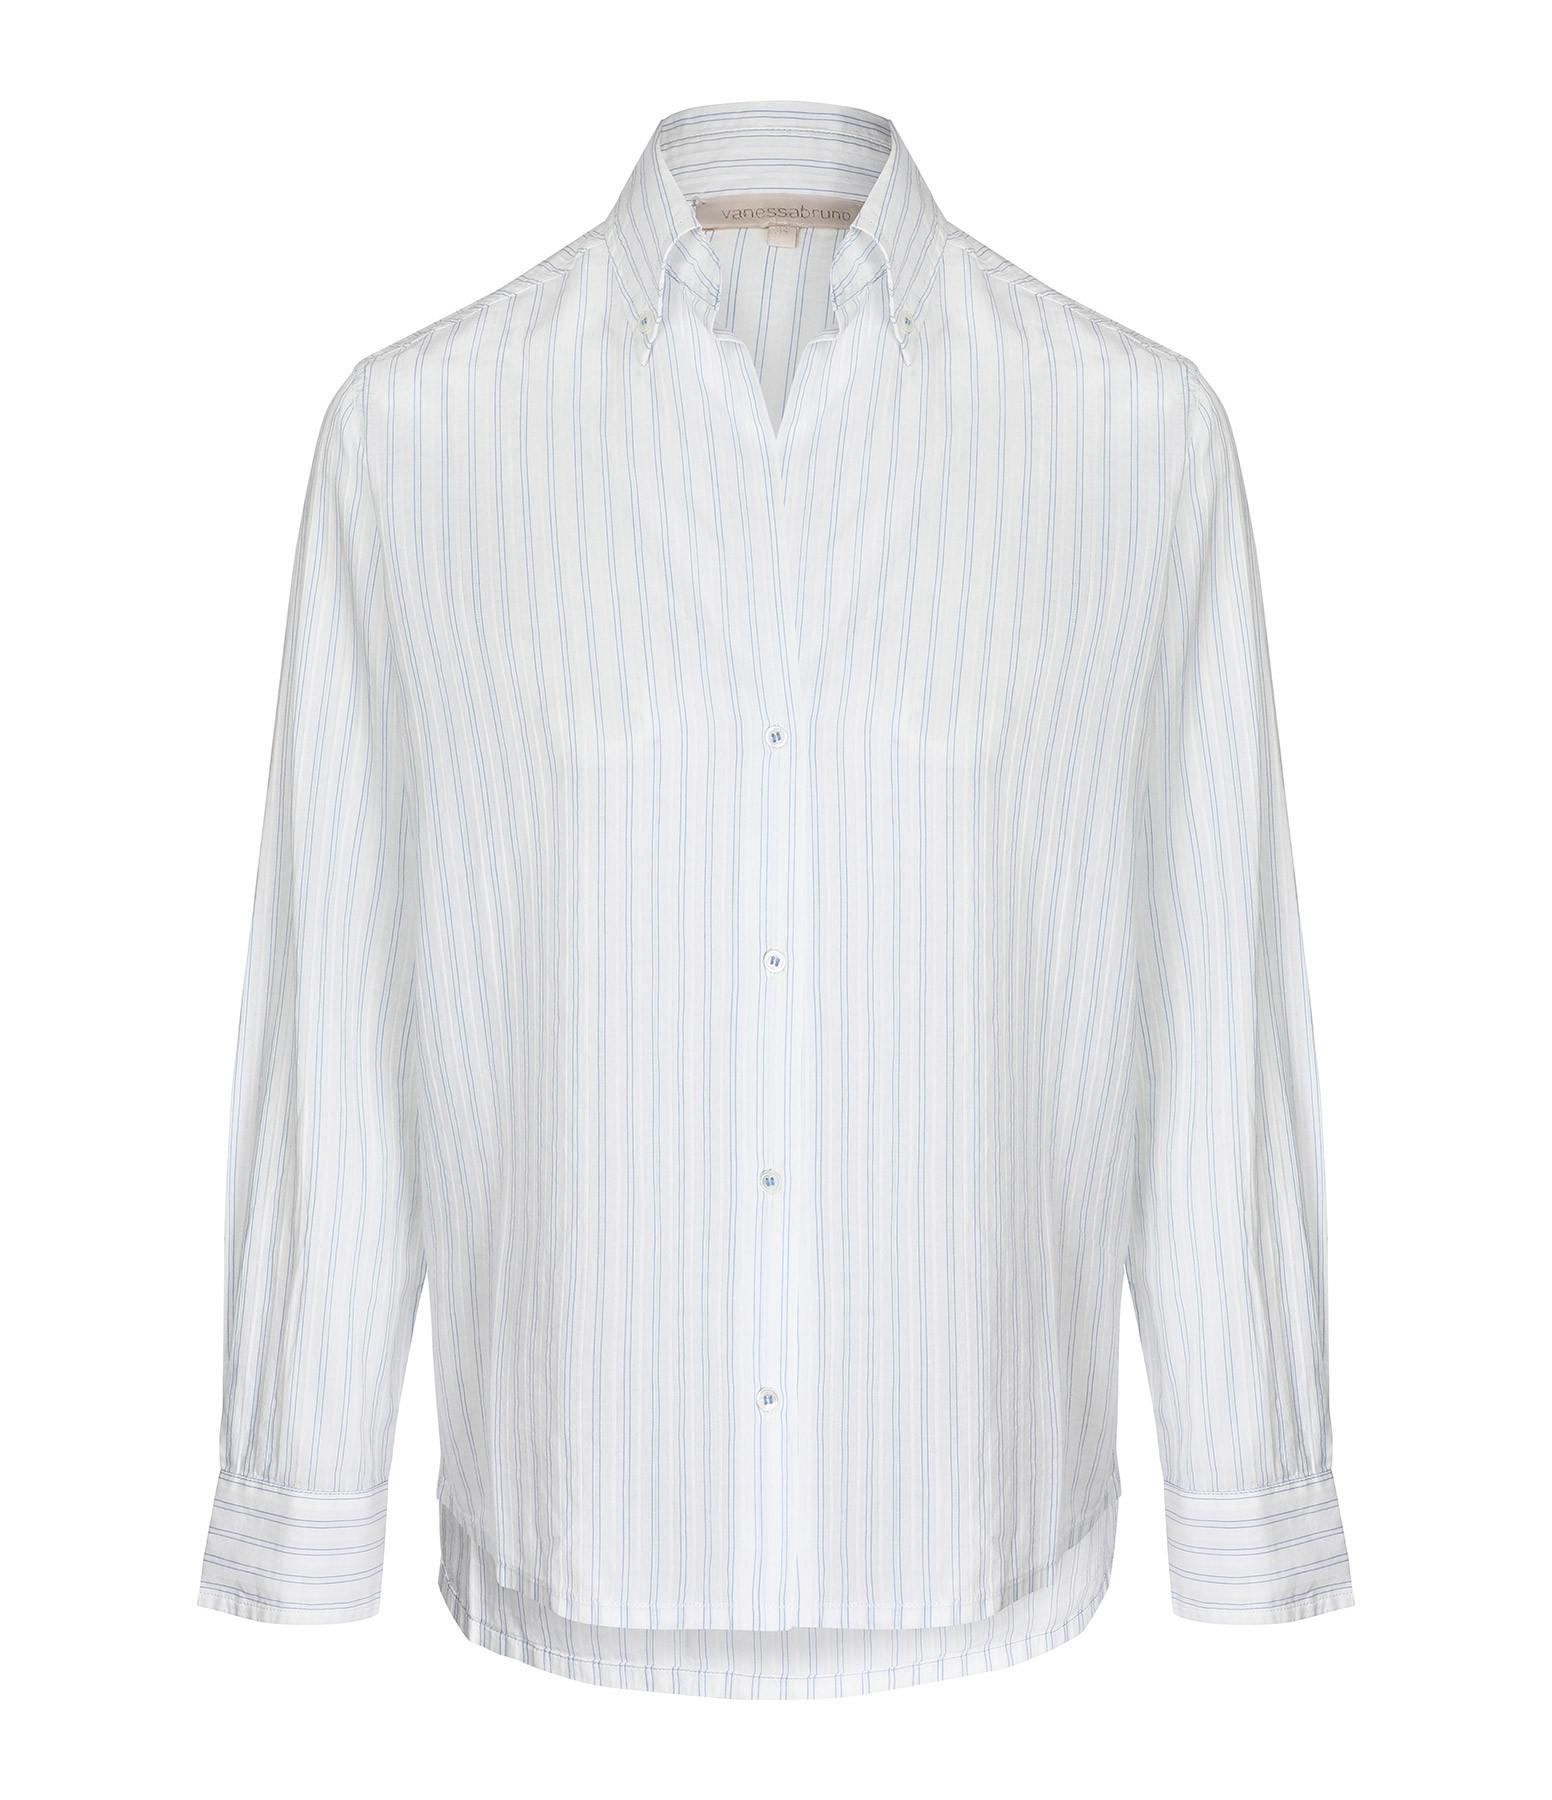 VANESSA BRUNO - Chemise Druyat Coton Blanc Bleu